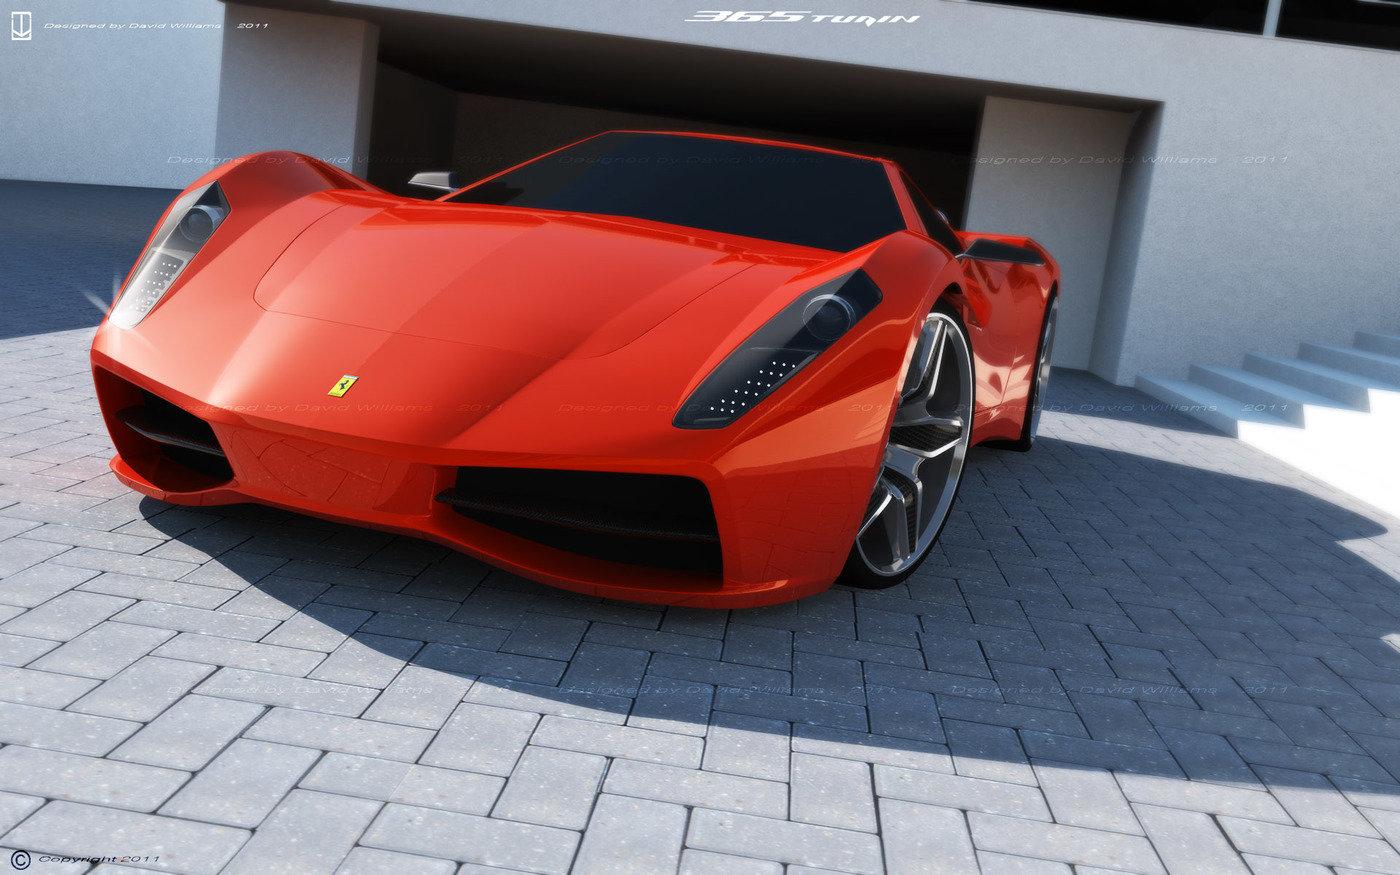 2011 concept supercars by David Williams at Coroflot.com